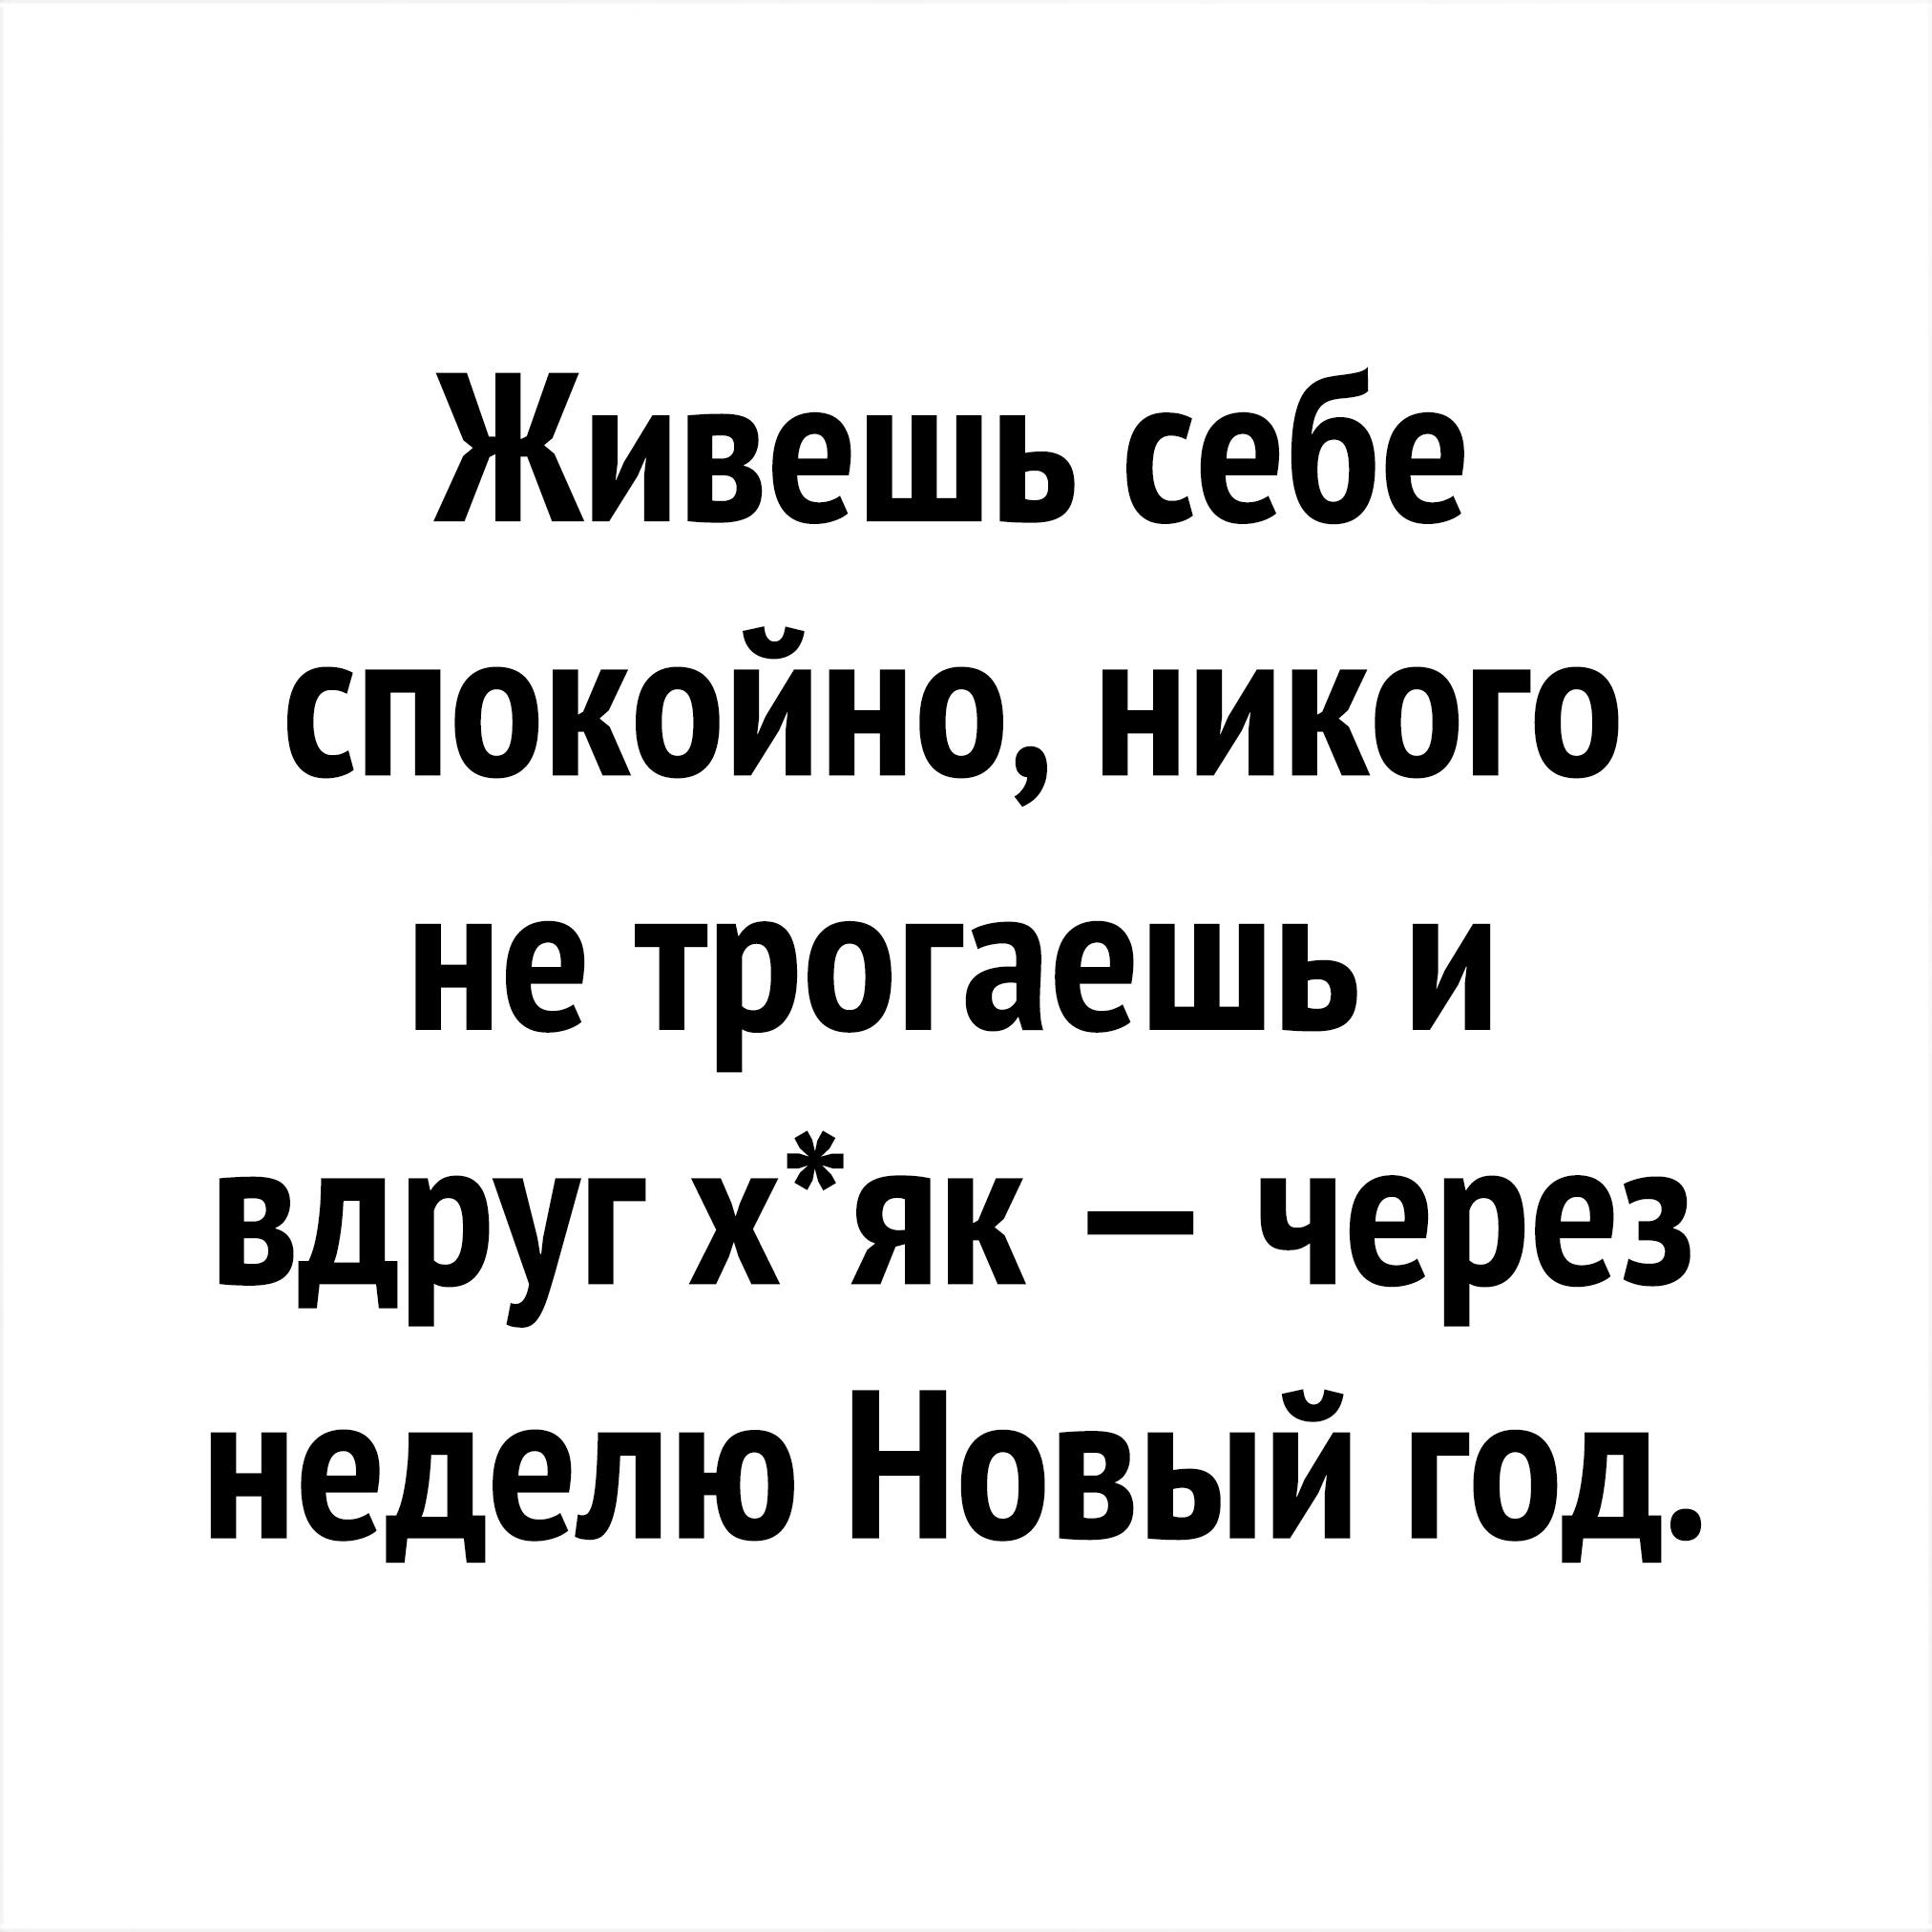 https://pp.userapi.com/LC0iEPpKfuTXjKY2ilm_XoKQvsQkexDQqpwM7Q/xU3D7BGwvuY.jpg